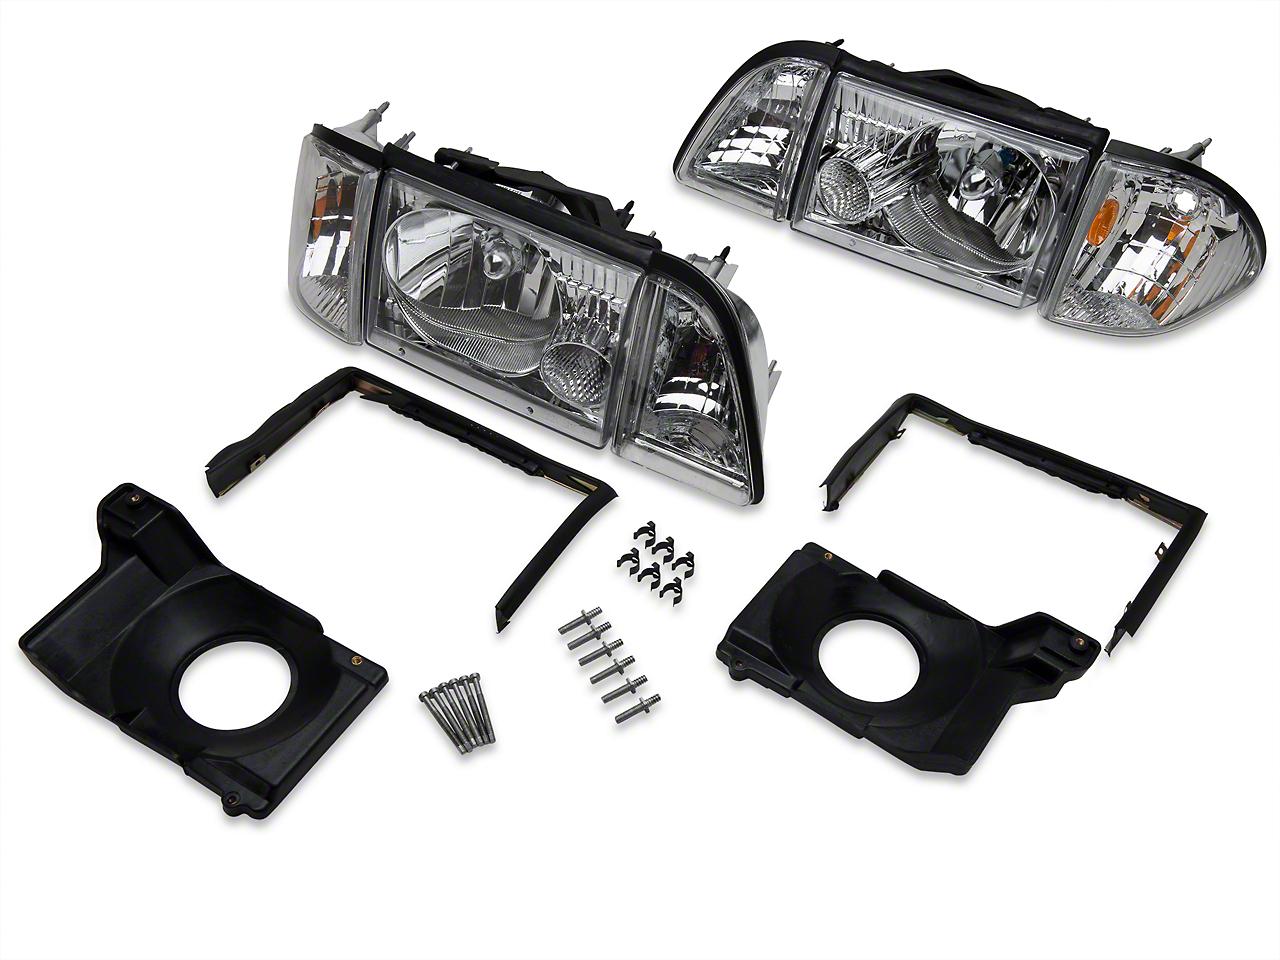 Chrome Headlights and Adjusting Plate Kit (87-93 All)